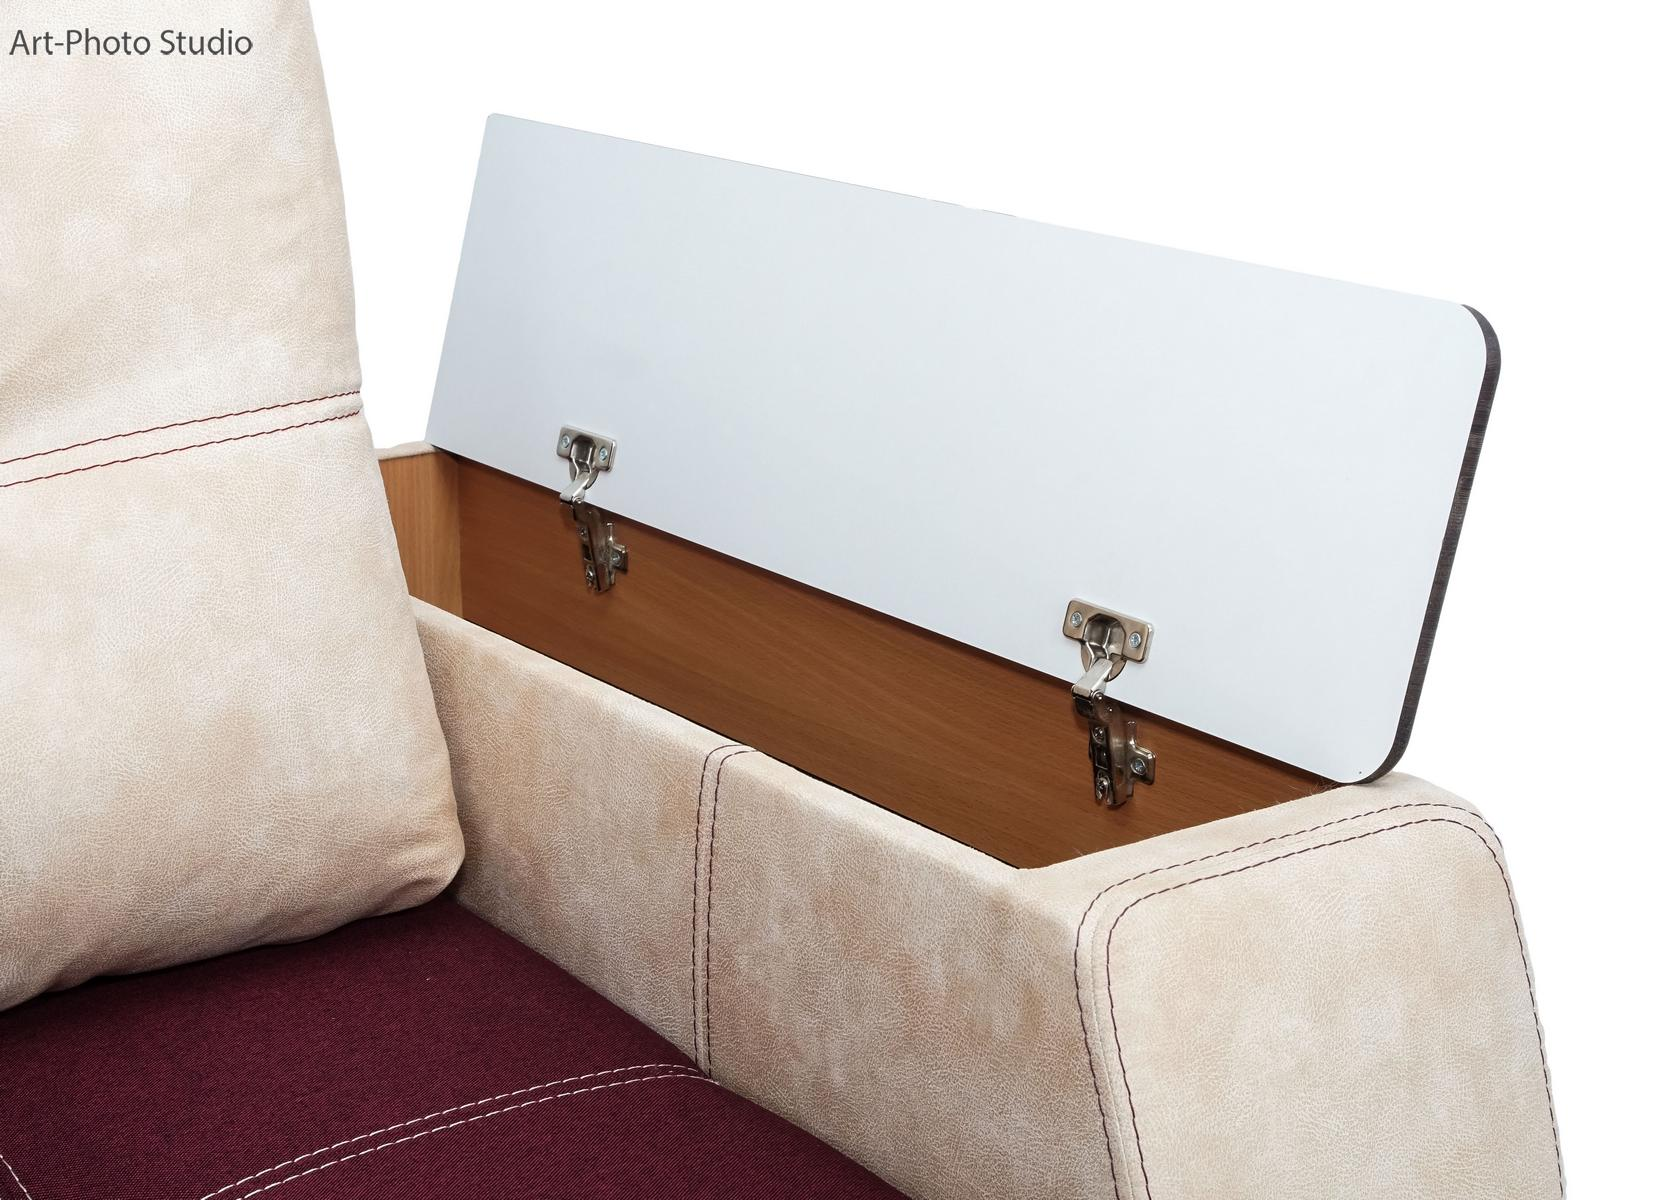 фотосъемка мягкой мебели для каталога в Харькове - элемент дивана